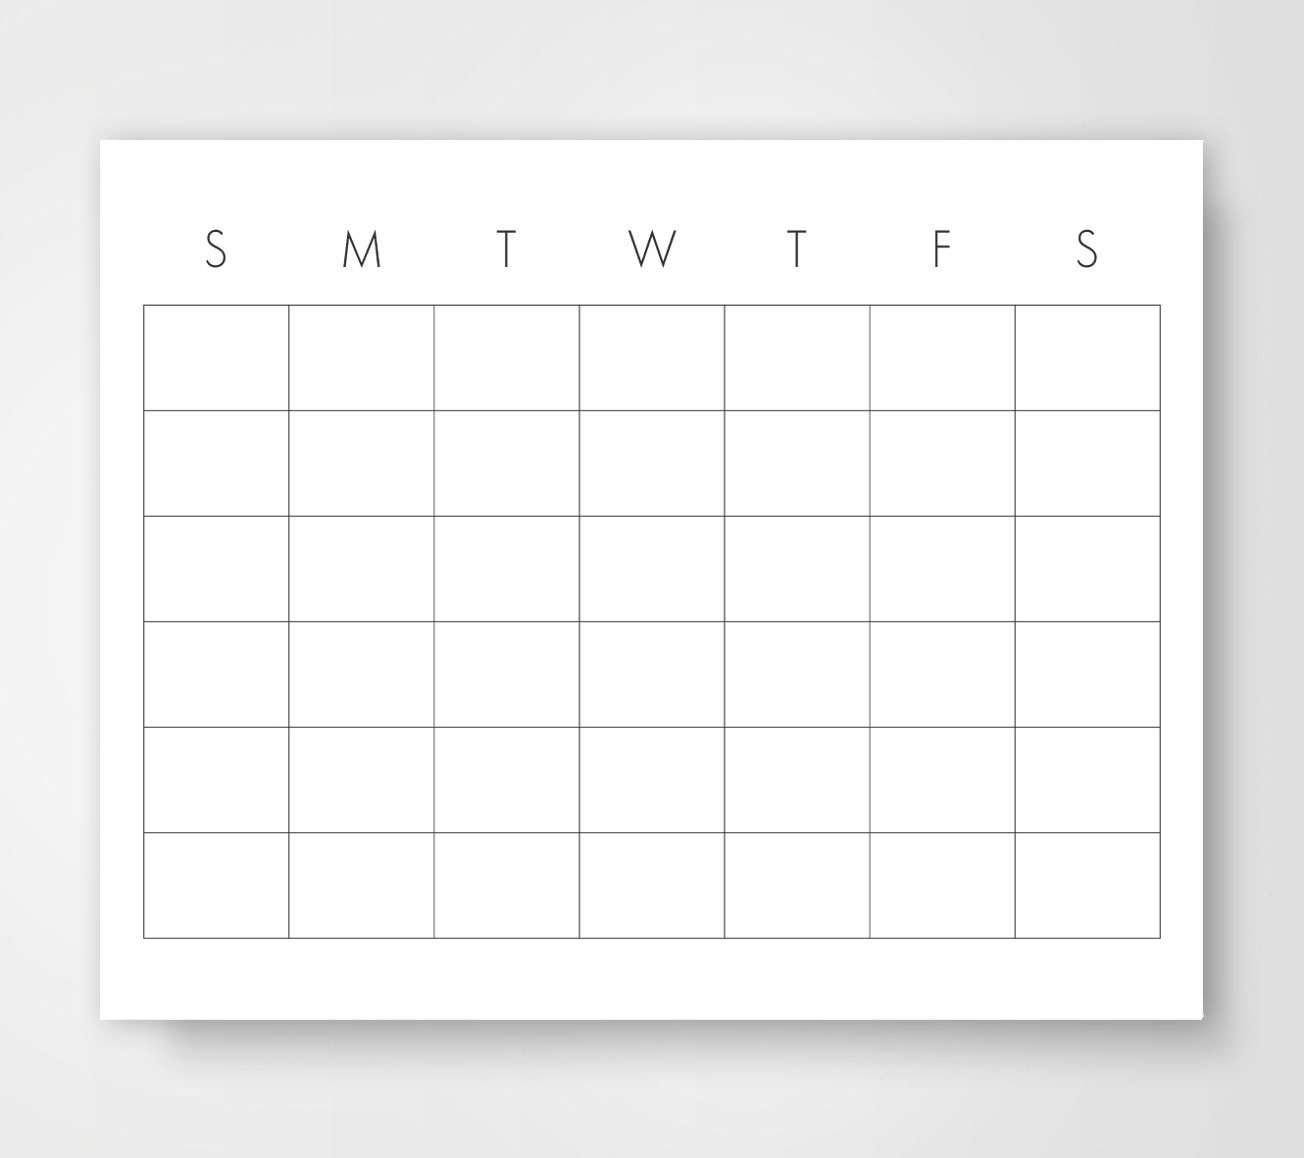 Printable Calendar 8 X 11 : Free Calendar Template 8X11 Sie Free April Calander